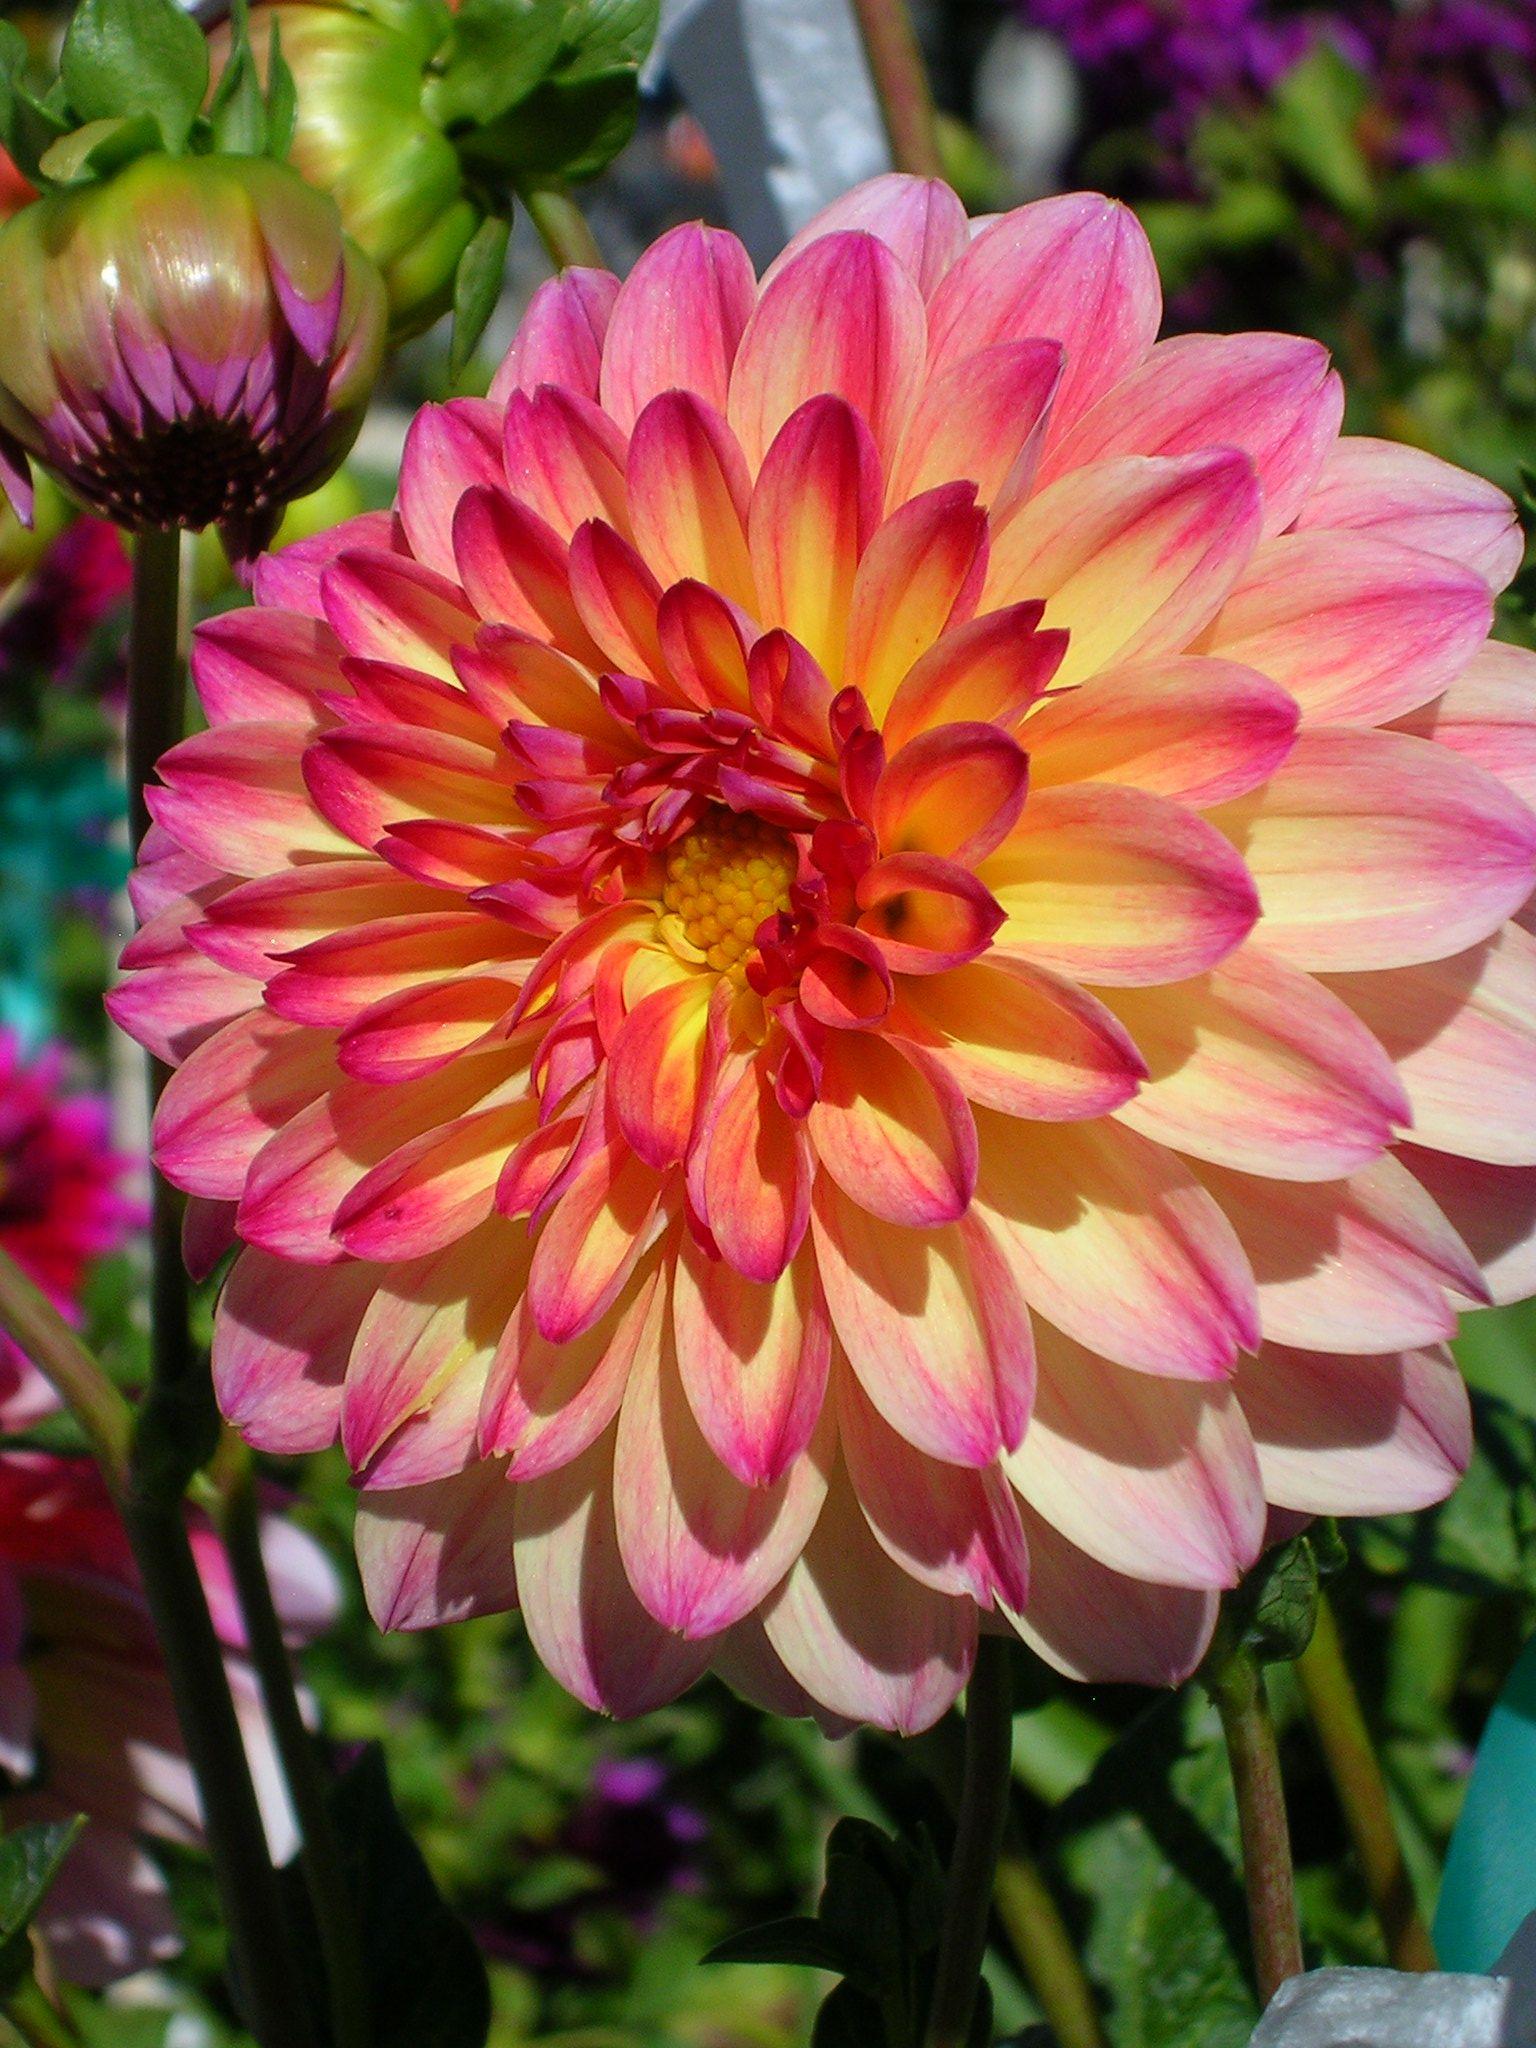 Dahlia september morn flowers flowers and more beautiful dahlia september morn izmirmasajfo